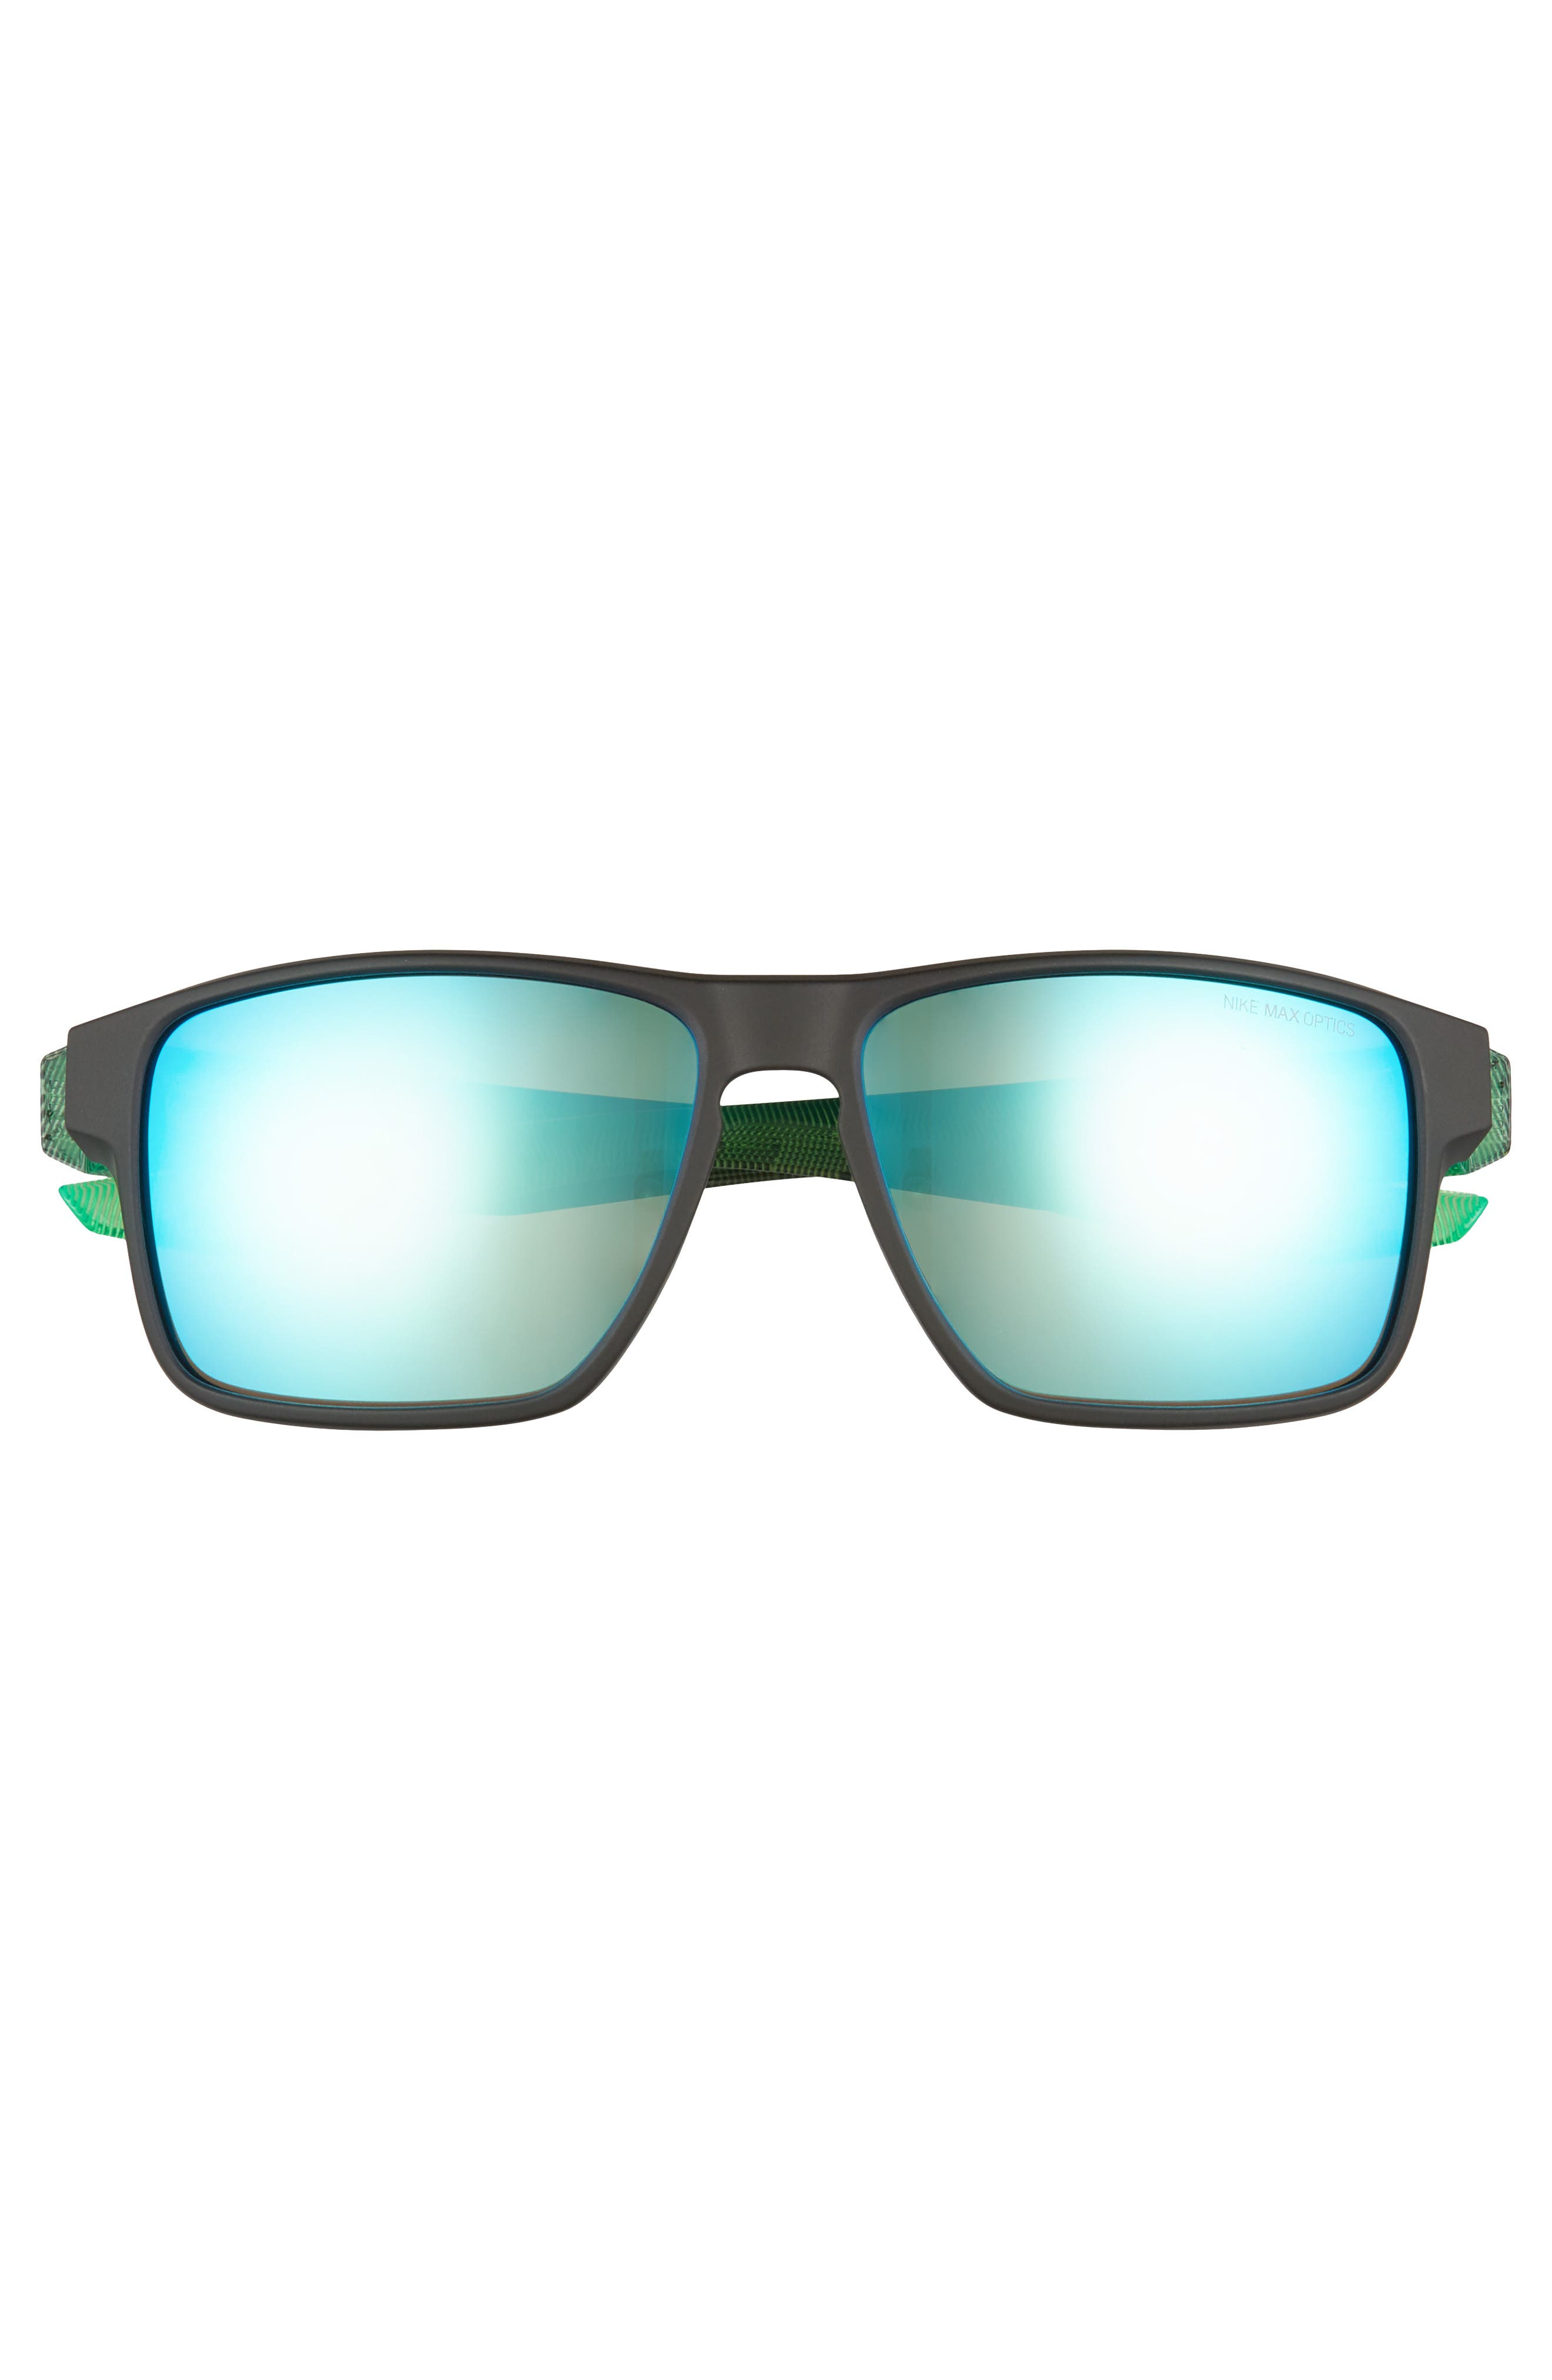 Essential Venture R 59mm Sunglasses,                             Alternate thumbnail 2, color,                             MATTE BLACK/ GREEN